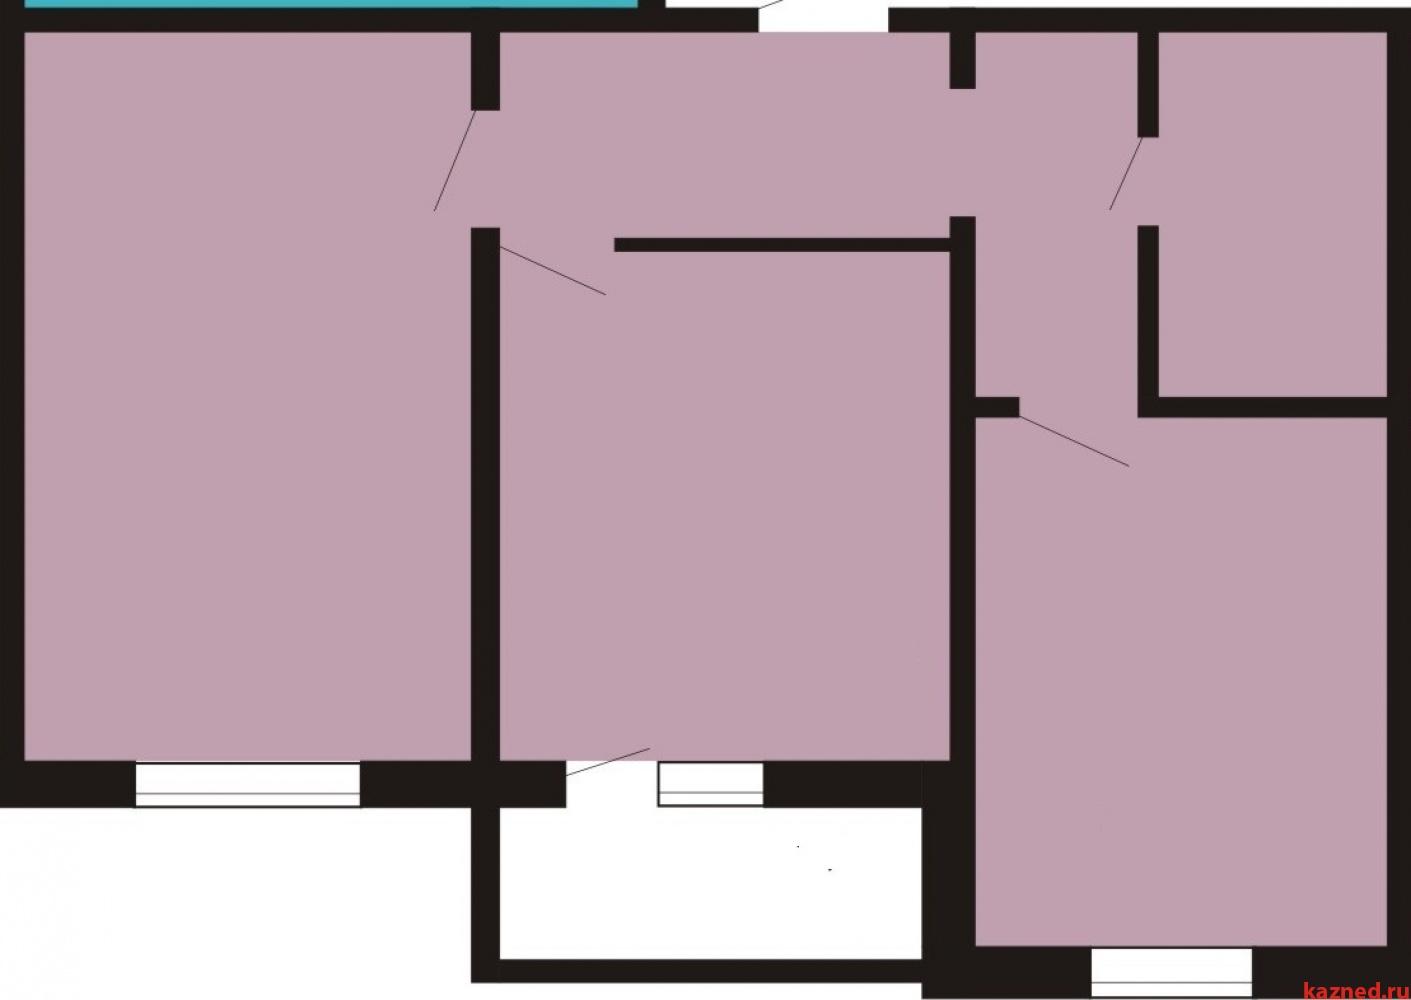 Продажа 2-к квартиры Н.Рахлина 7, 60 м² (миниатюра №5)